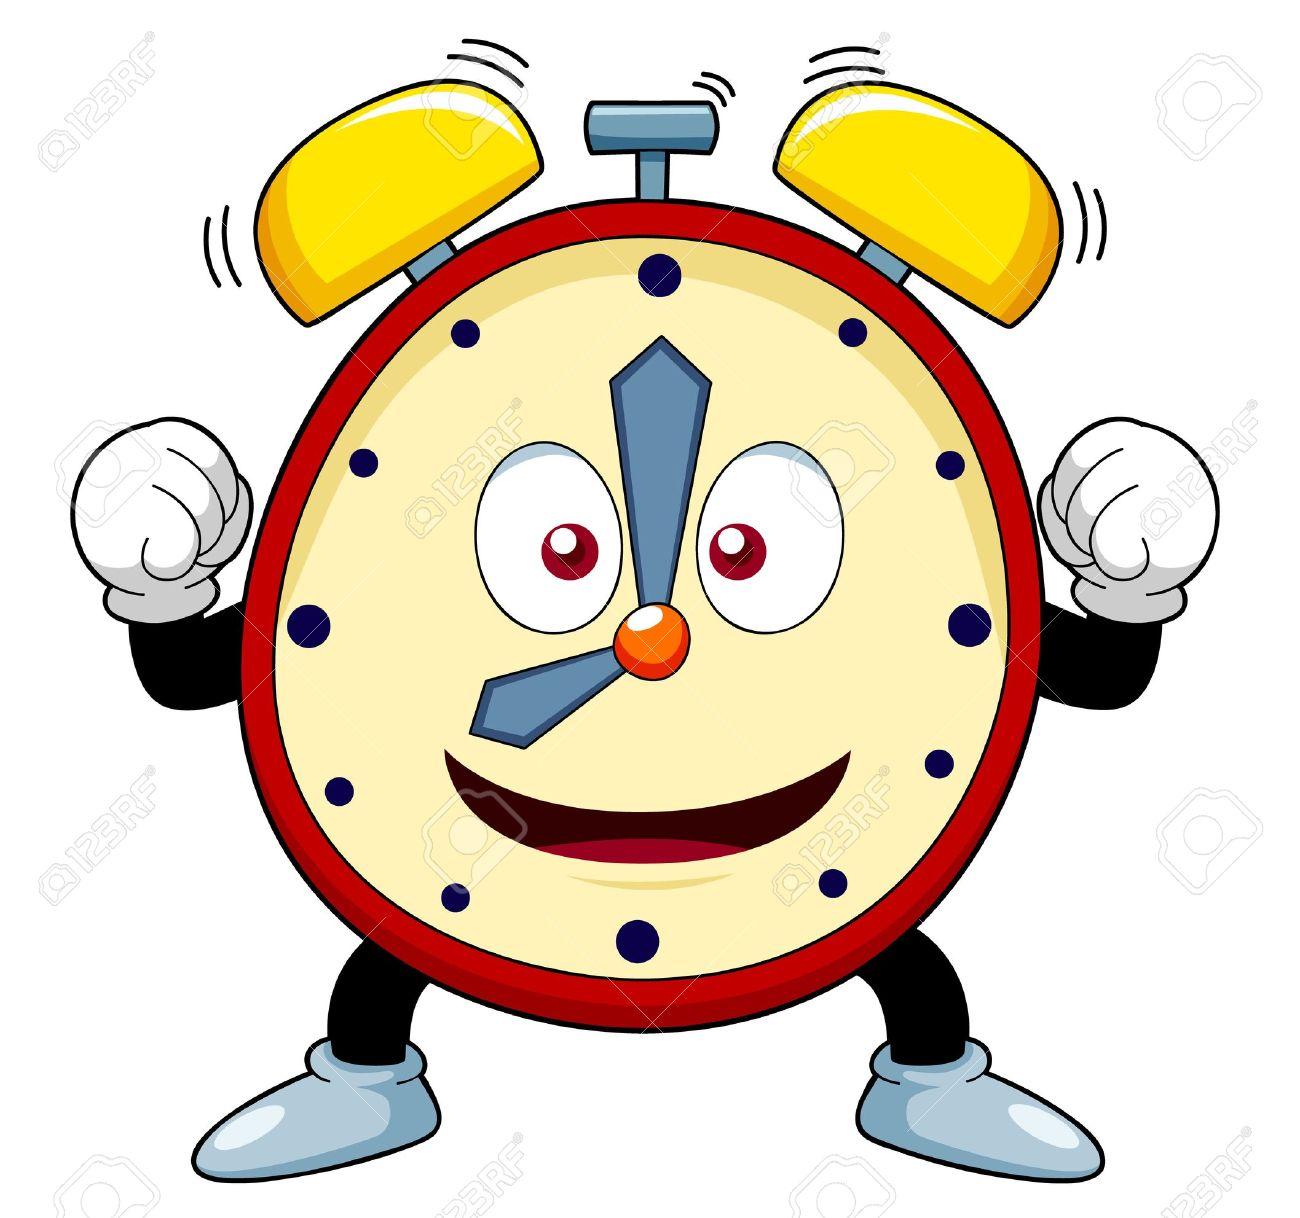 alarm clock clipart. illustration of cartoon alarm clock stock vector 16608711 clipart